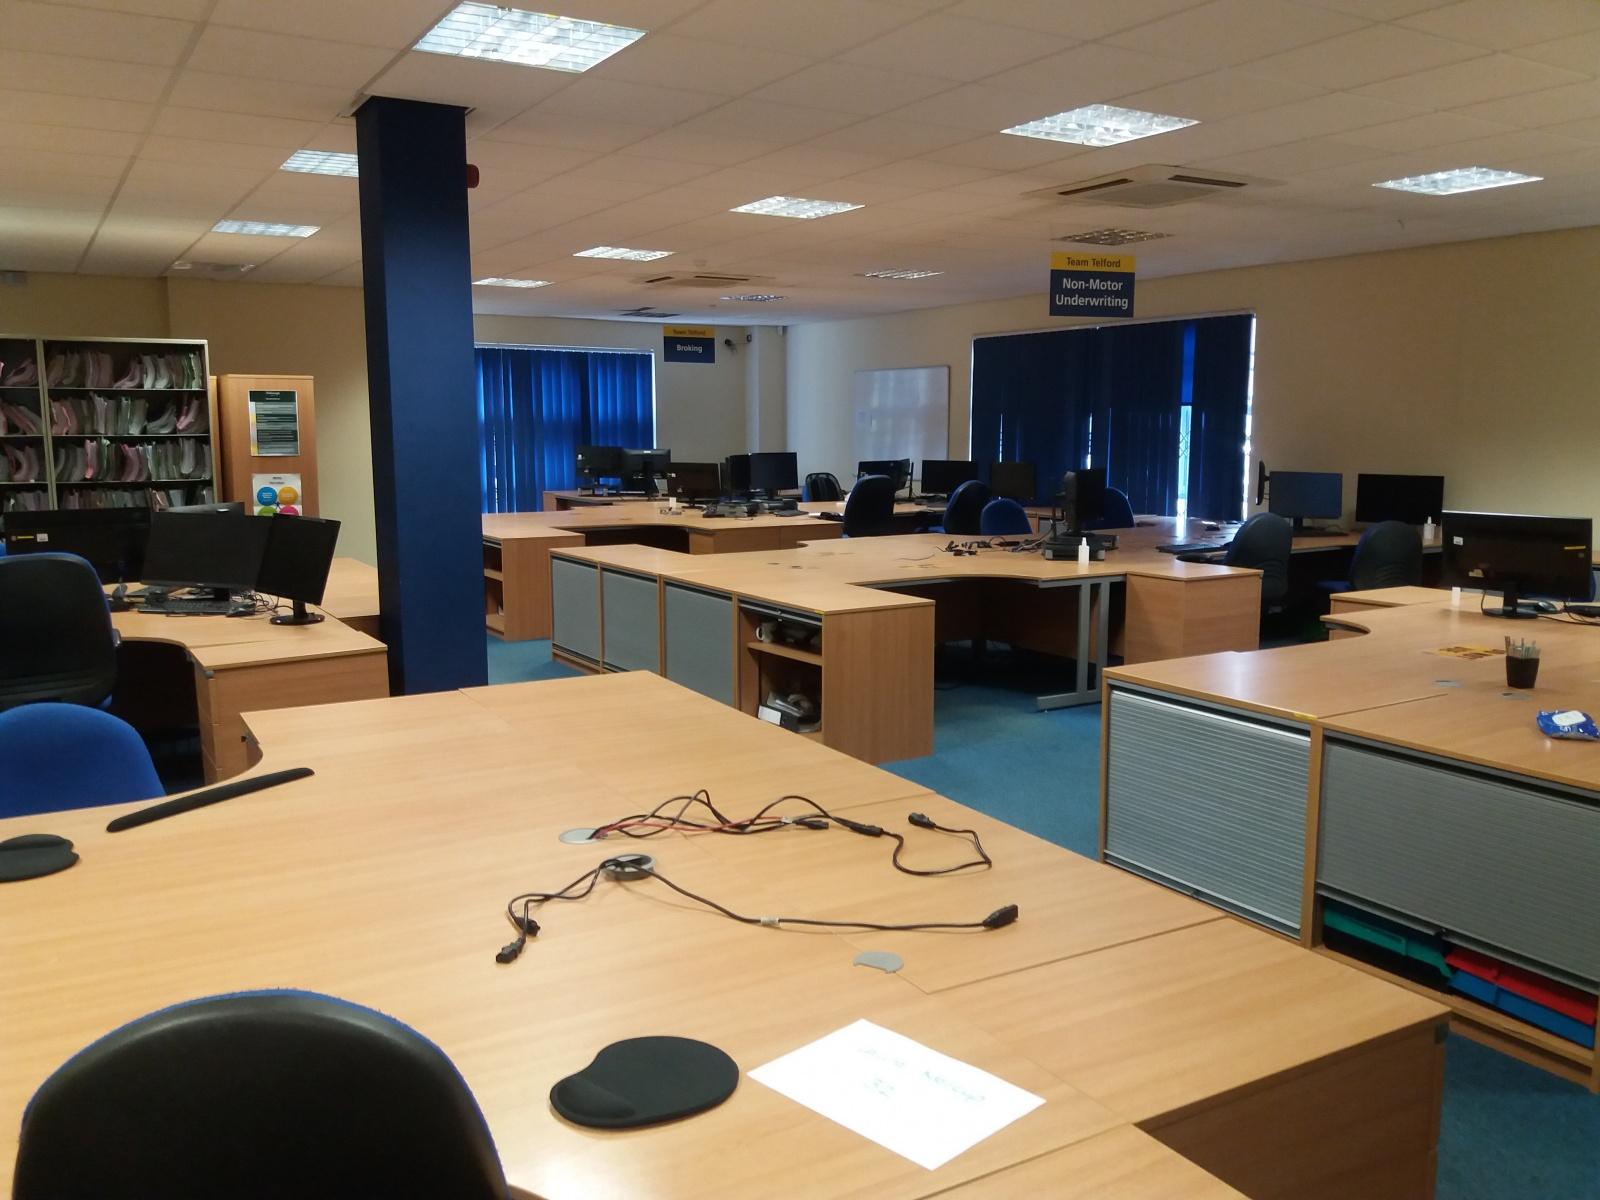 Ground Floor Office Suite, Towergate House, Euston Way, Telford, Shropshire